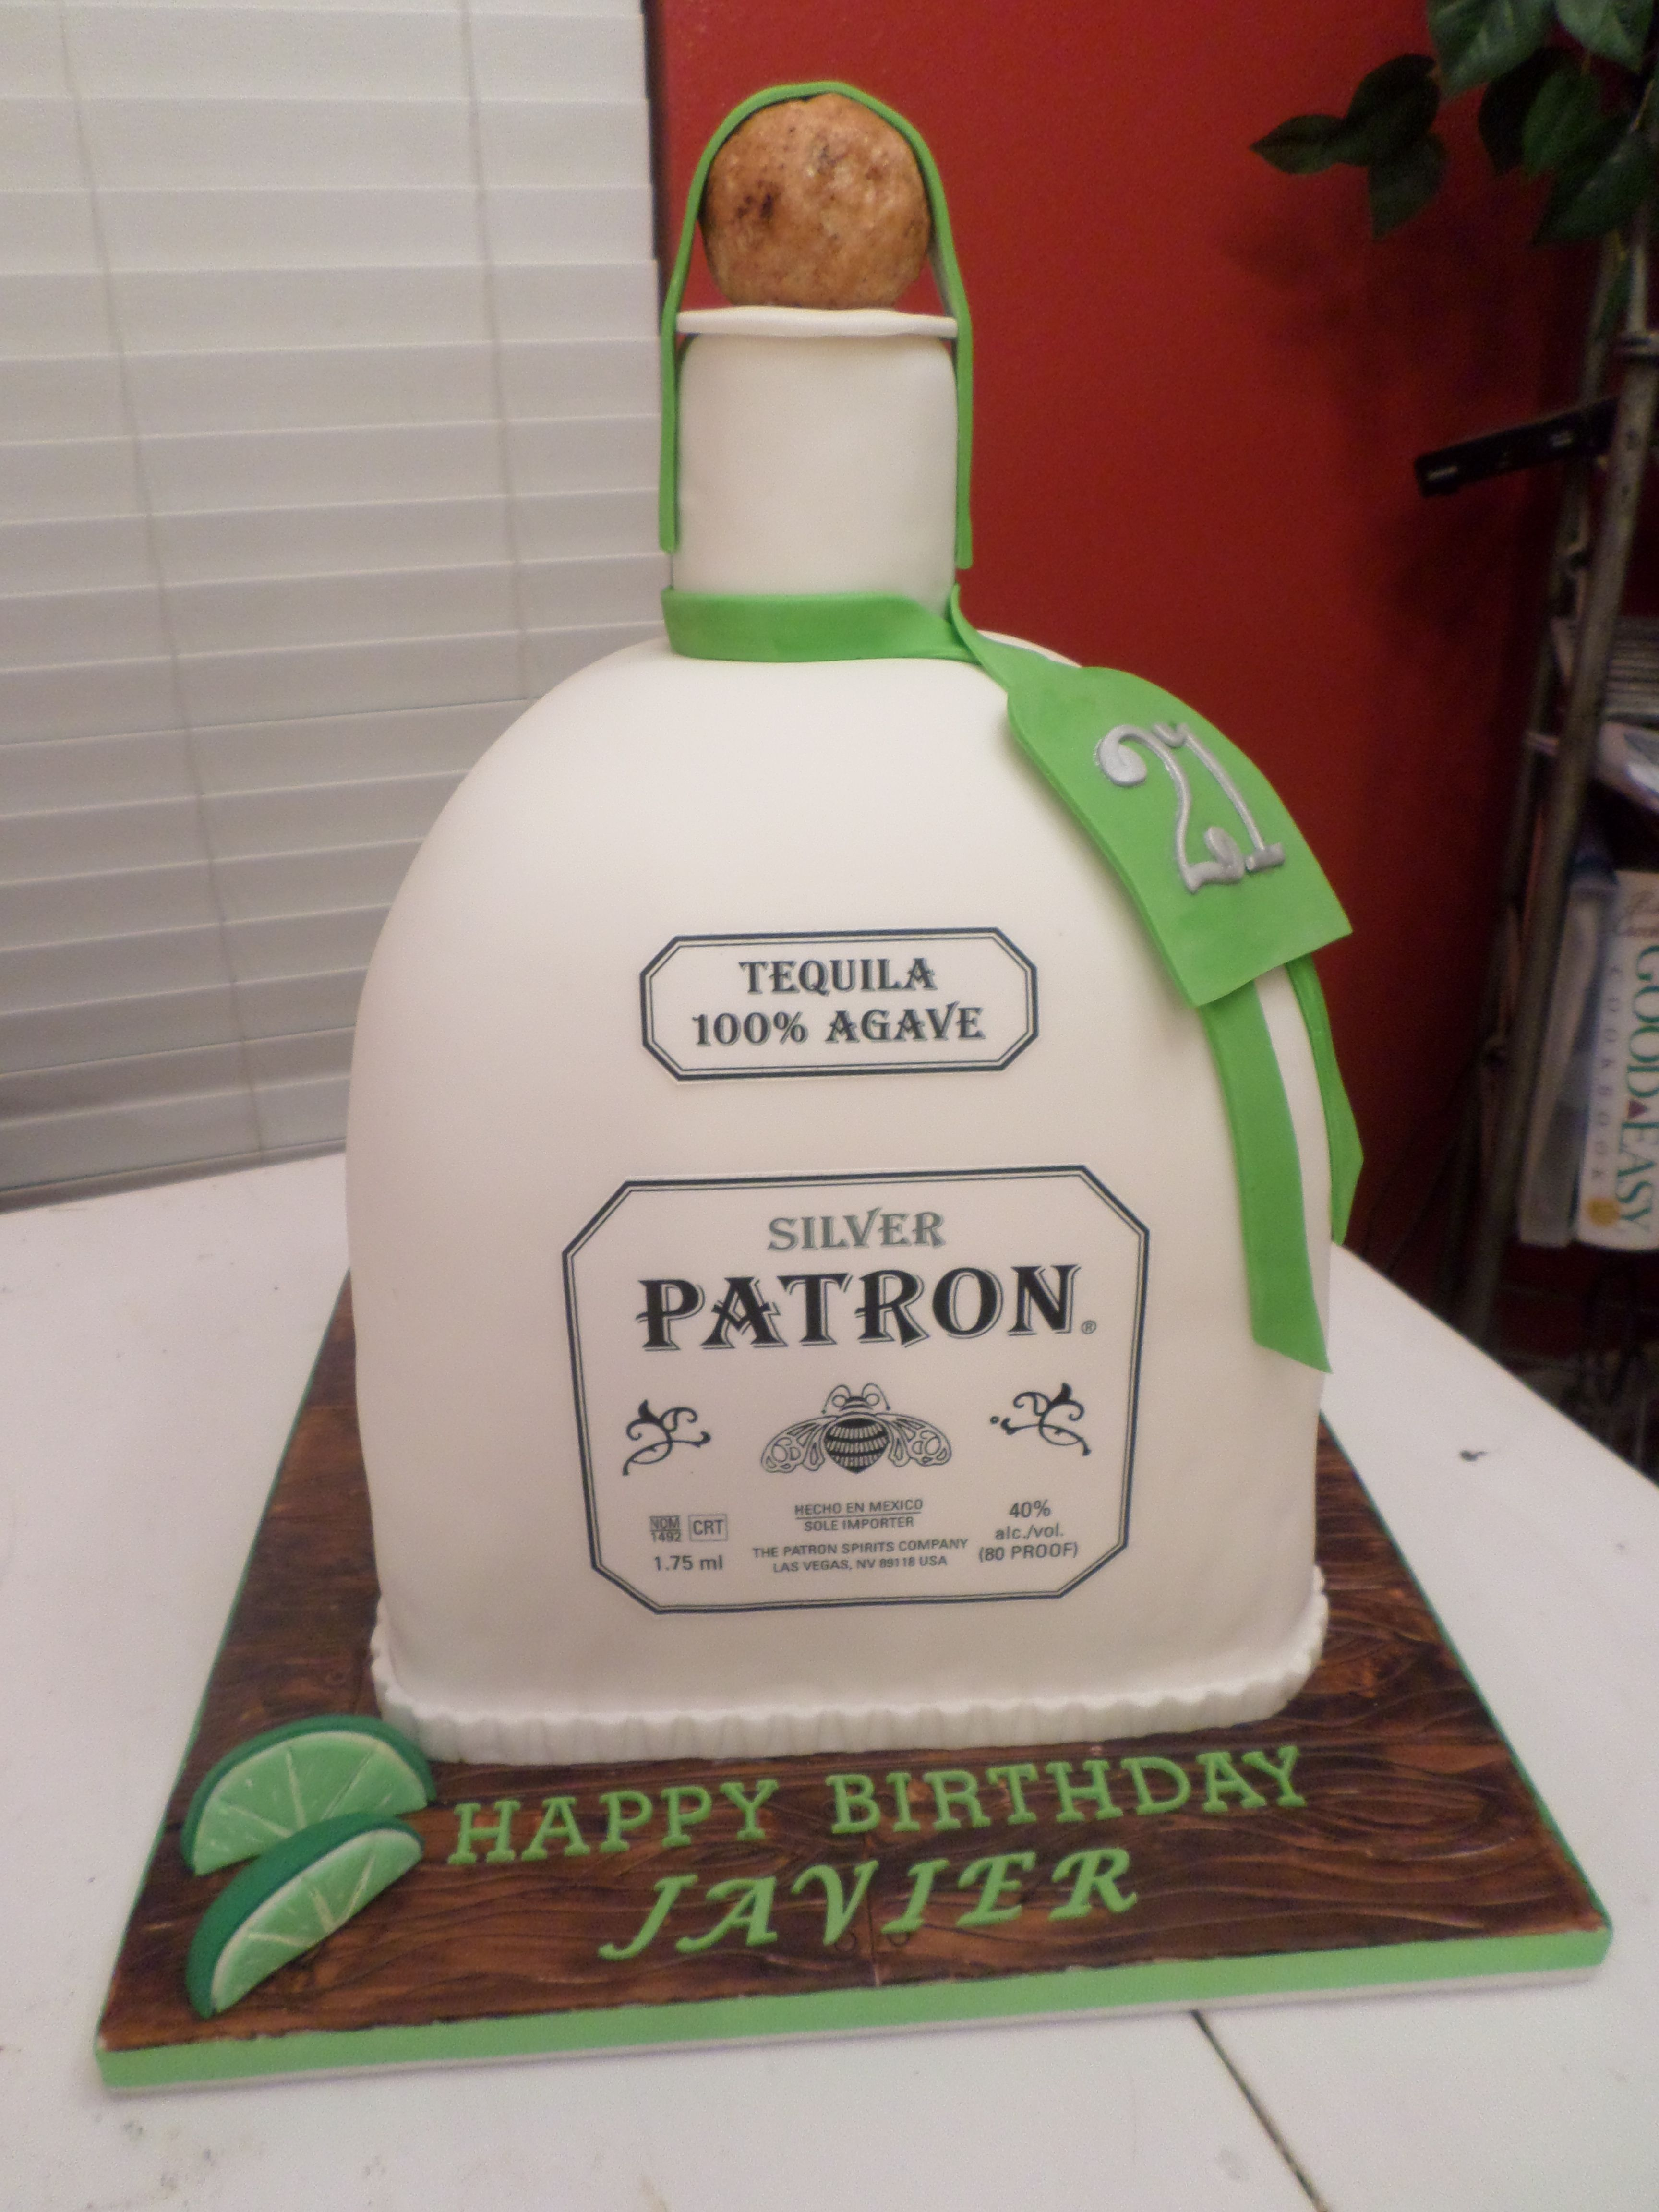 Patron Bottle Cake Sweets  Treats Pinterest Bottle Cake - Patron birthday cake